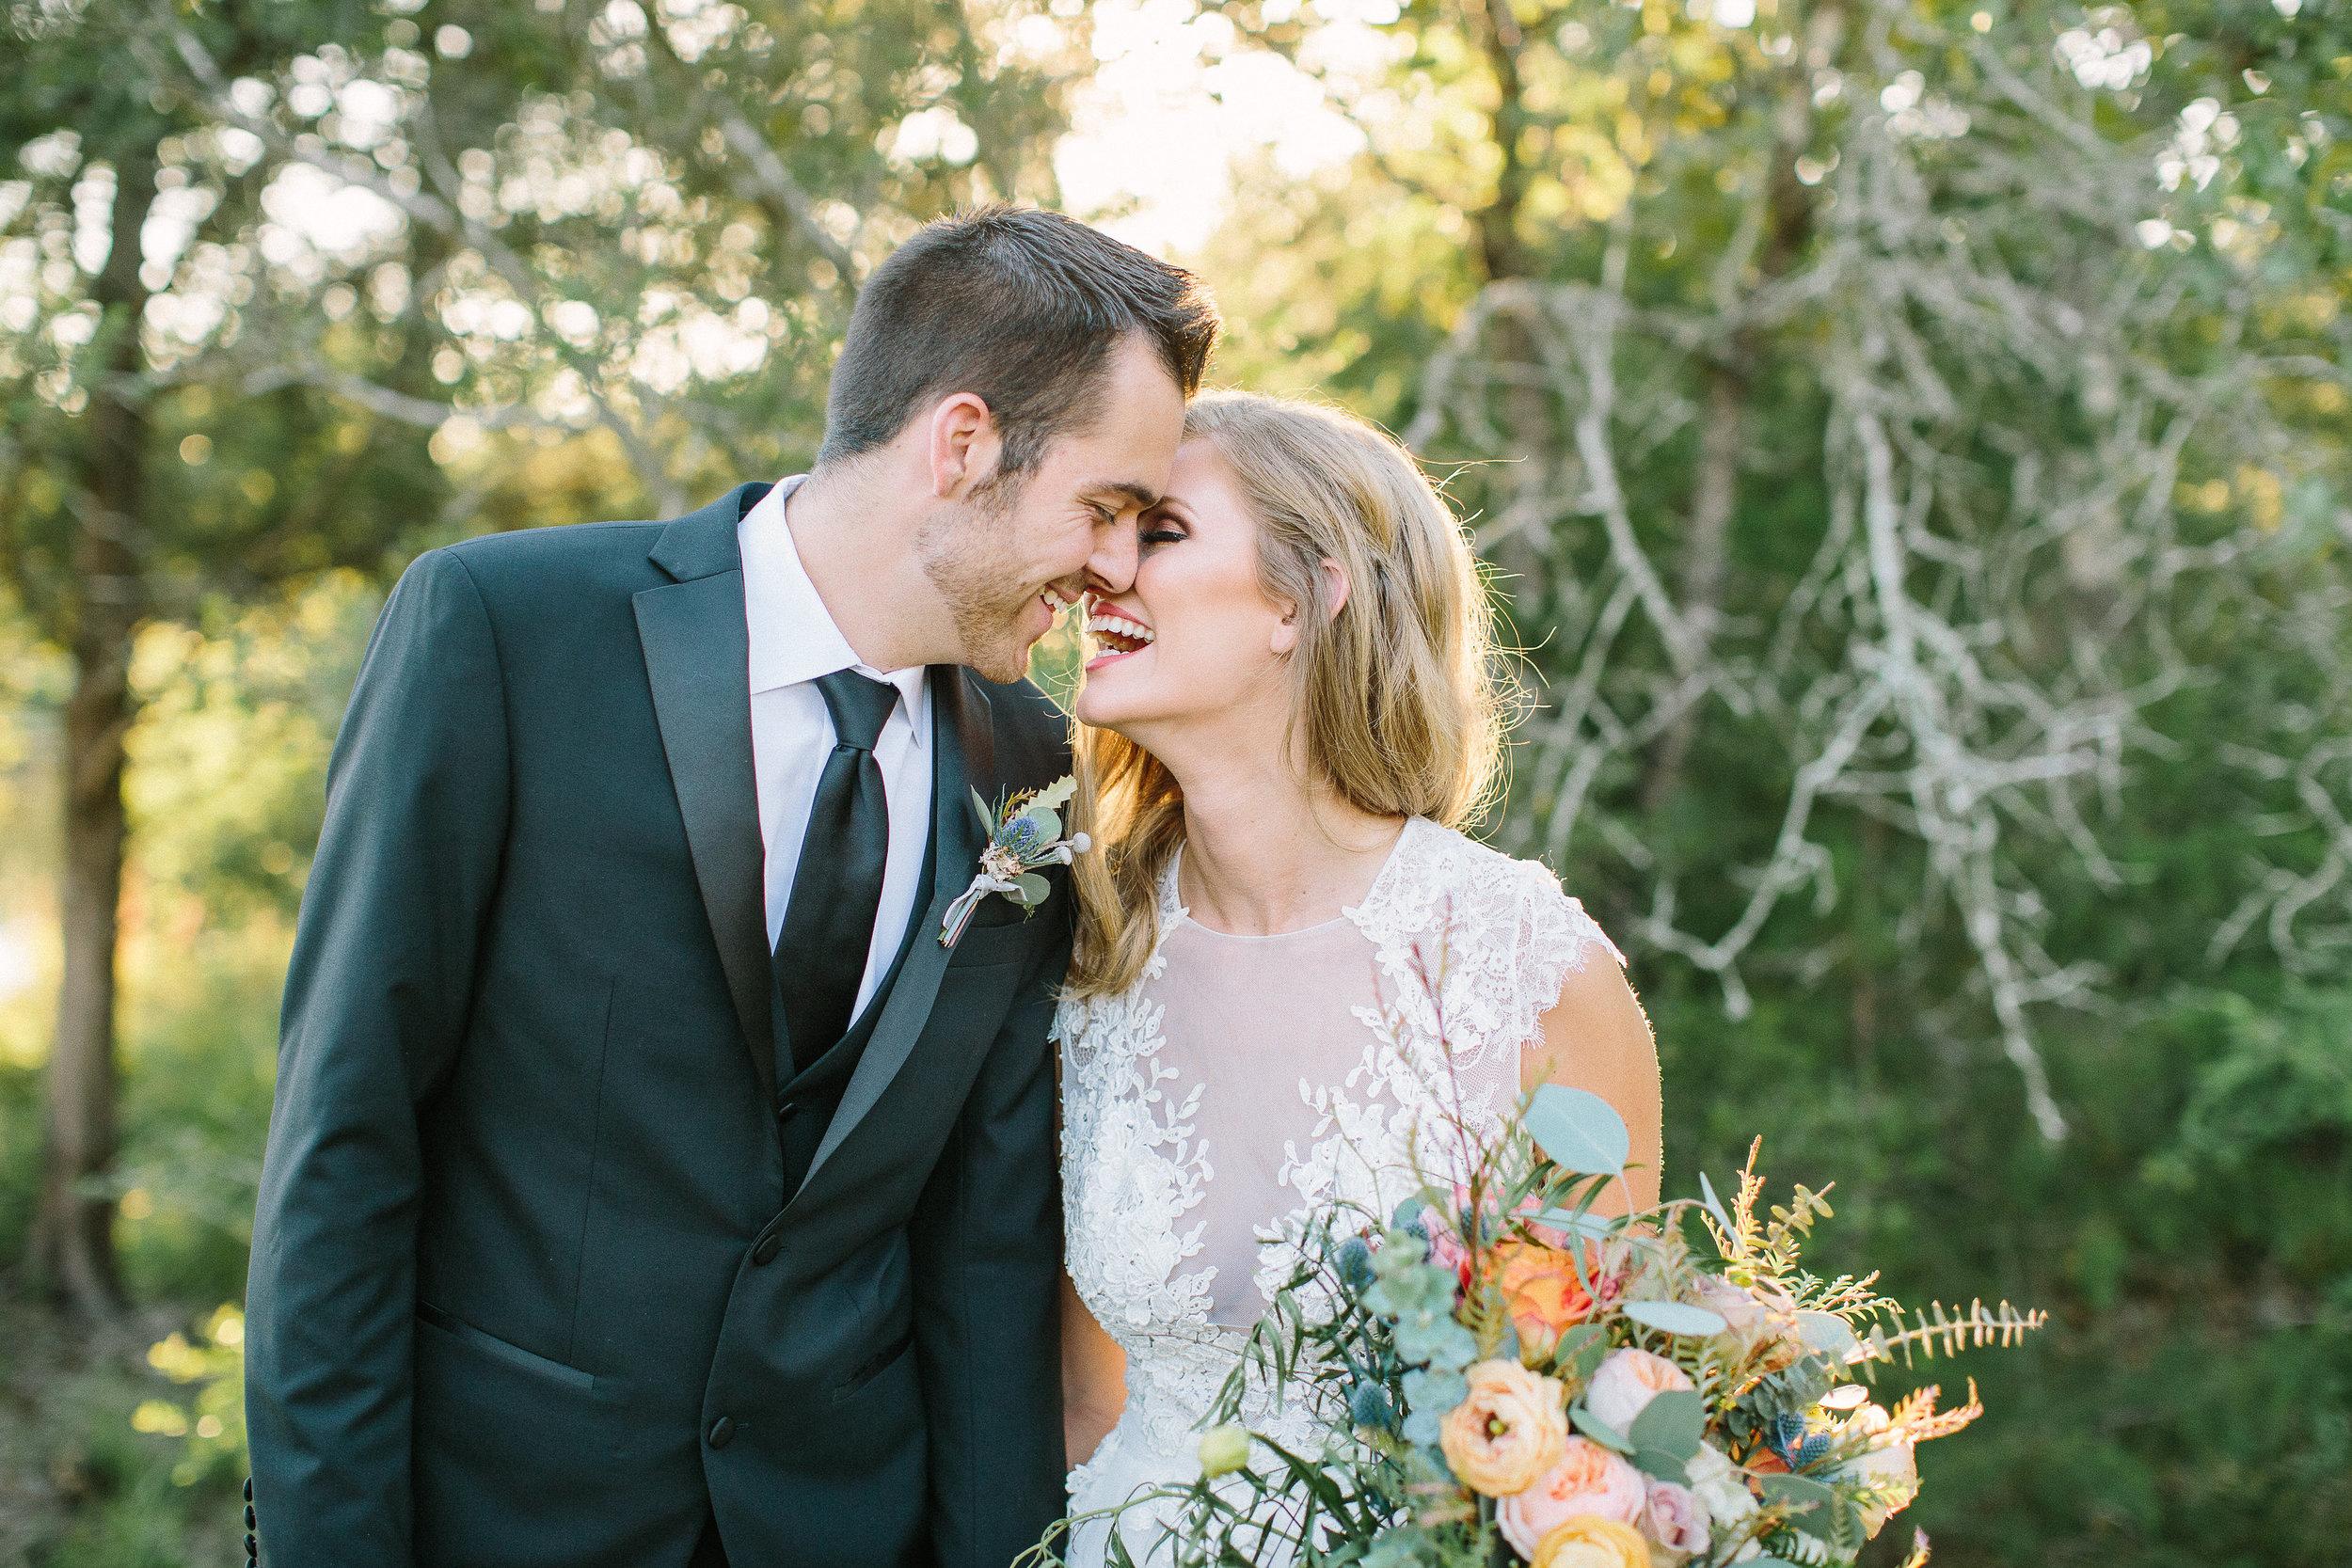 Ellen-Ashton-Photography-Peach-Creek-Ranch-Weddings-Wed-and-Prosper286.jpg